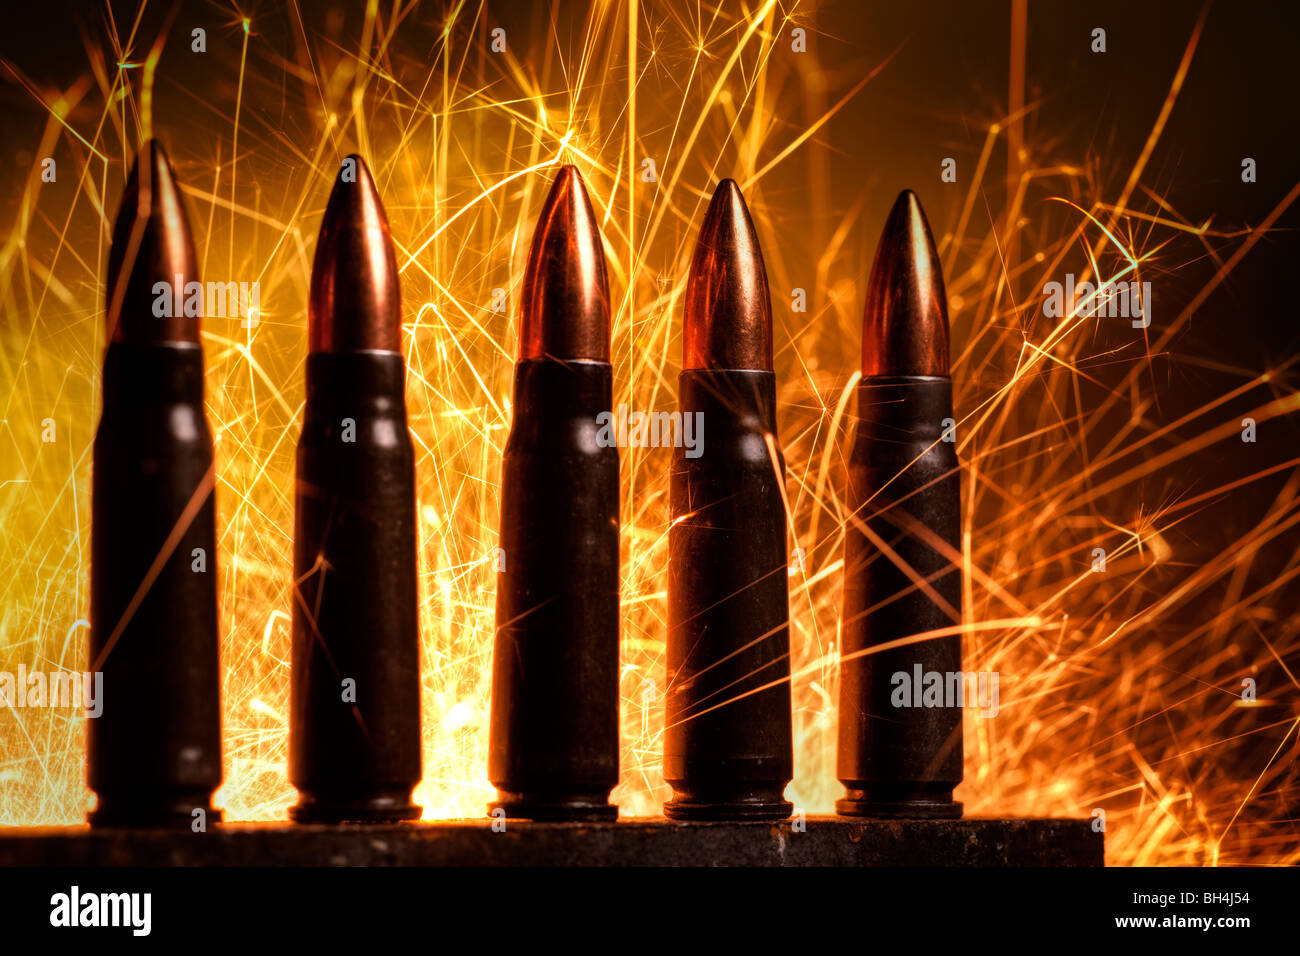 AK-47 assault rifle cartridges - Stock Image